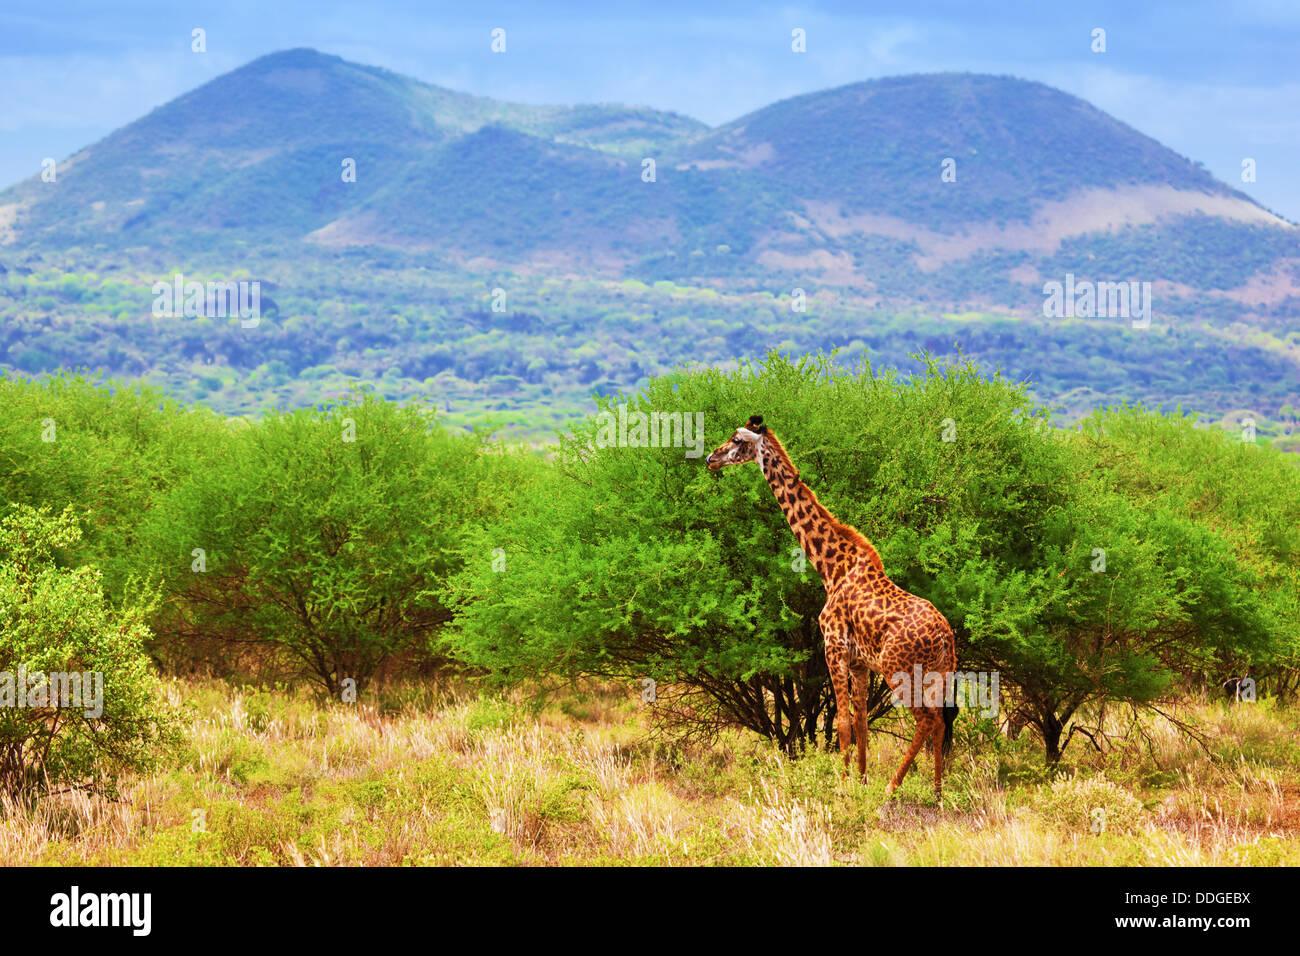 Jirafa en Tsavo West National Park, Kenia, África - fauna africana Imagen De Stock